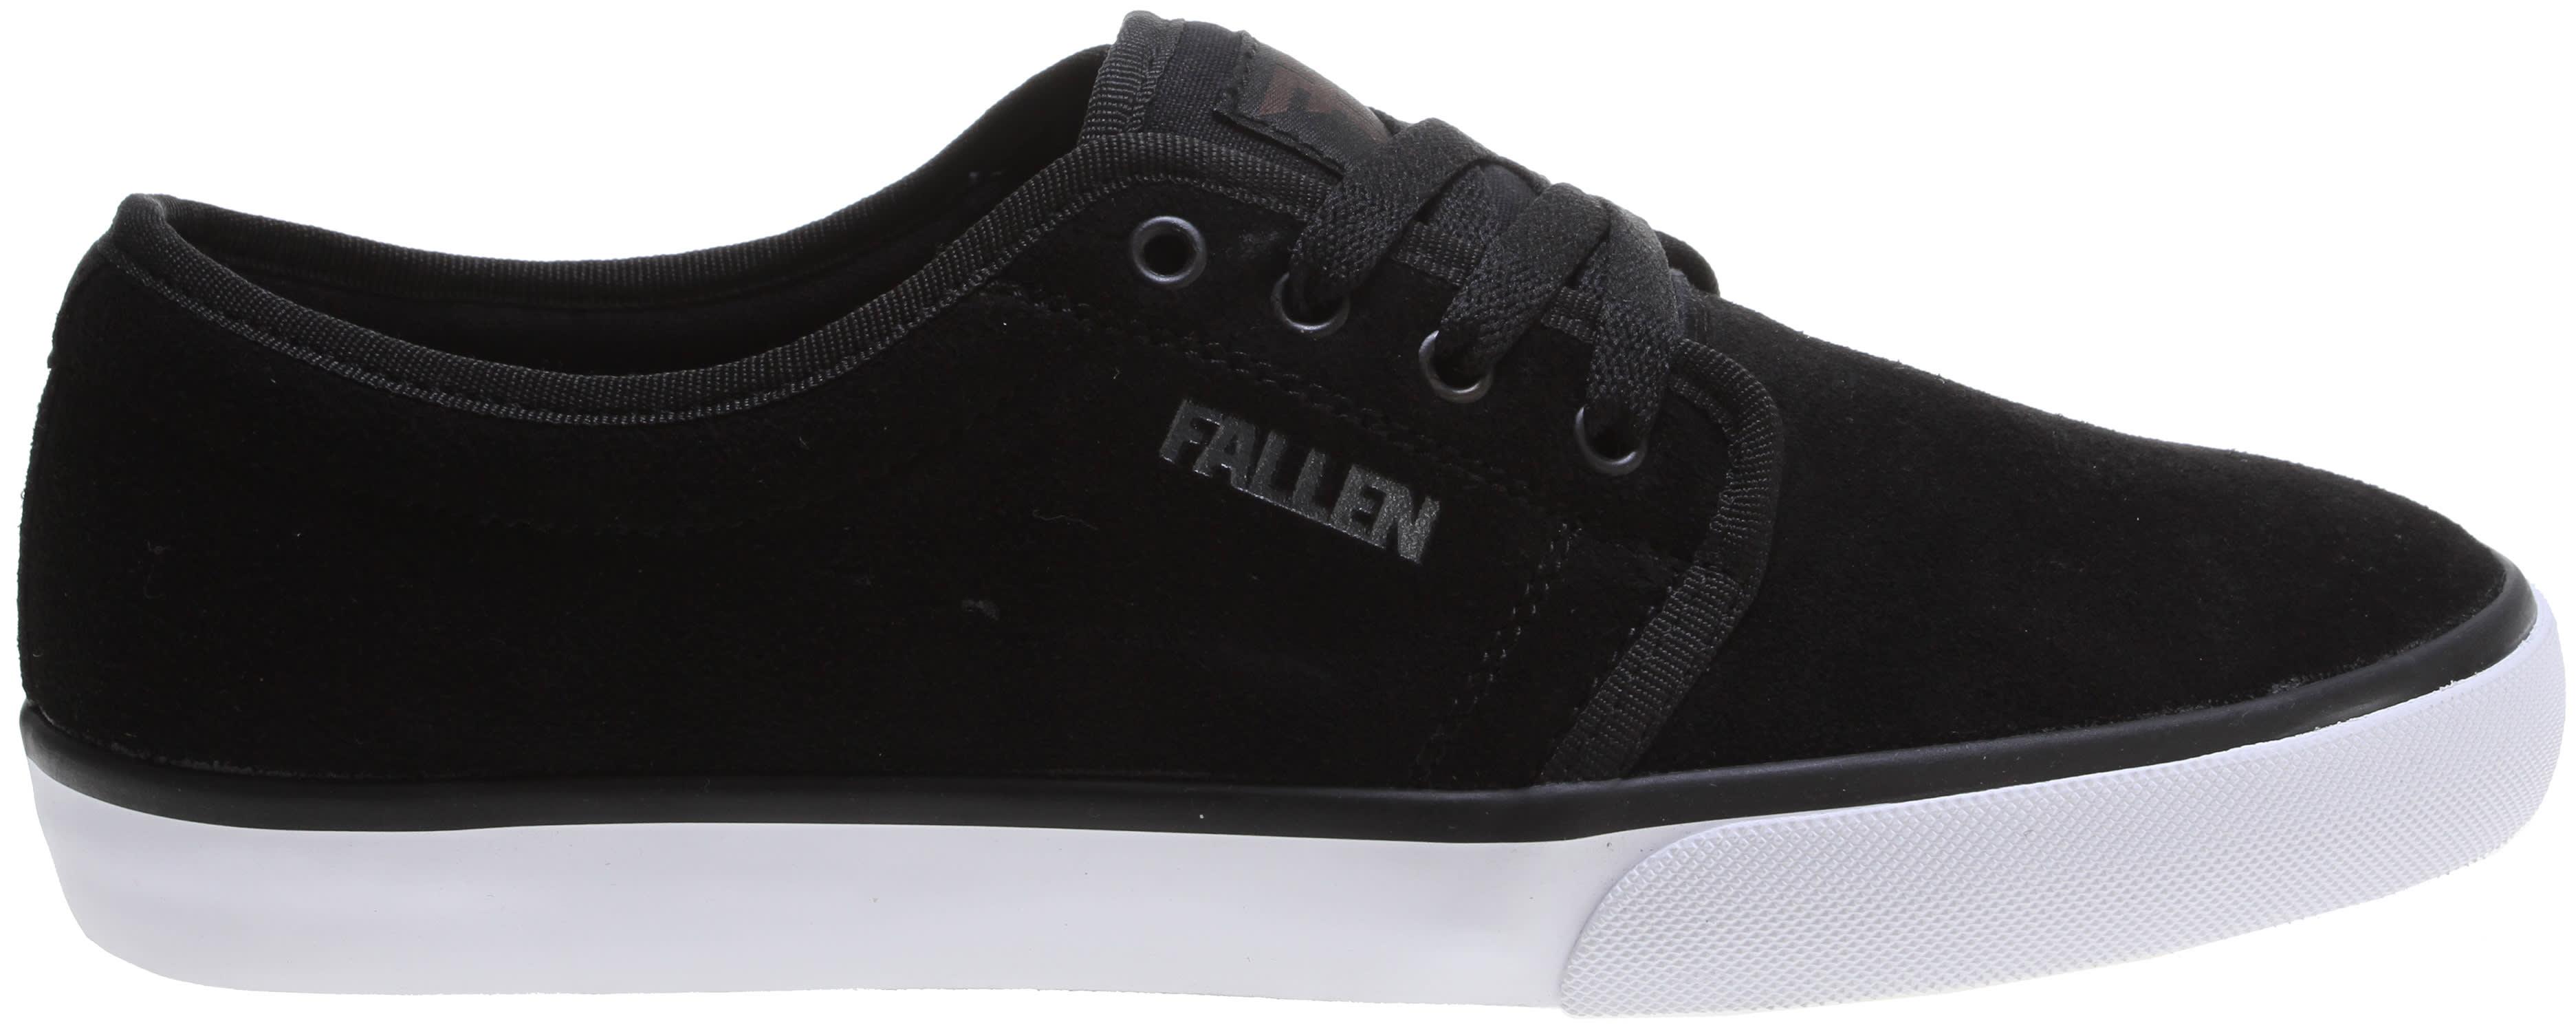 fb7cb5c337 Fallen Forte 2 Skate Shoes - thumbnail 1